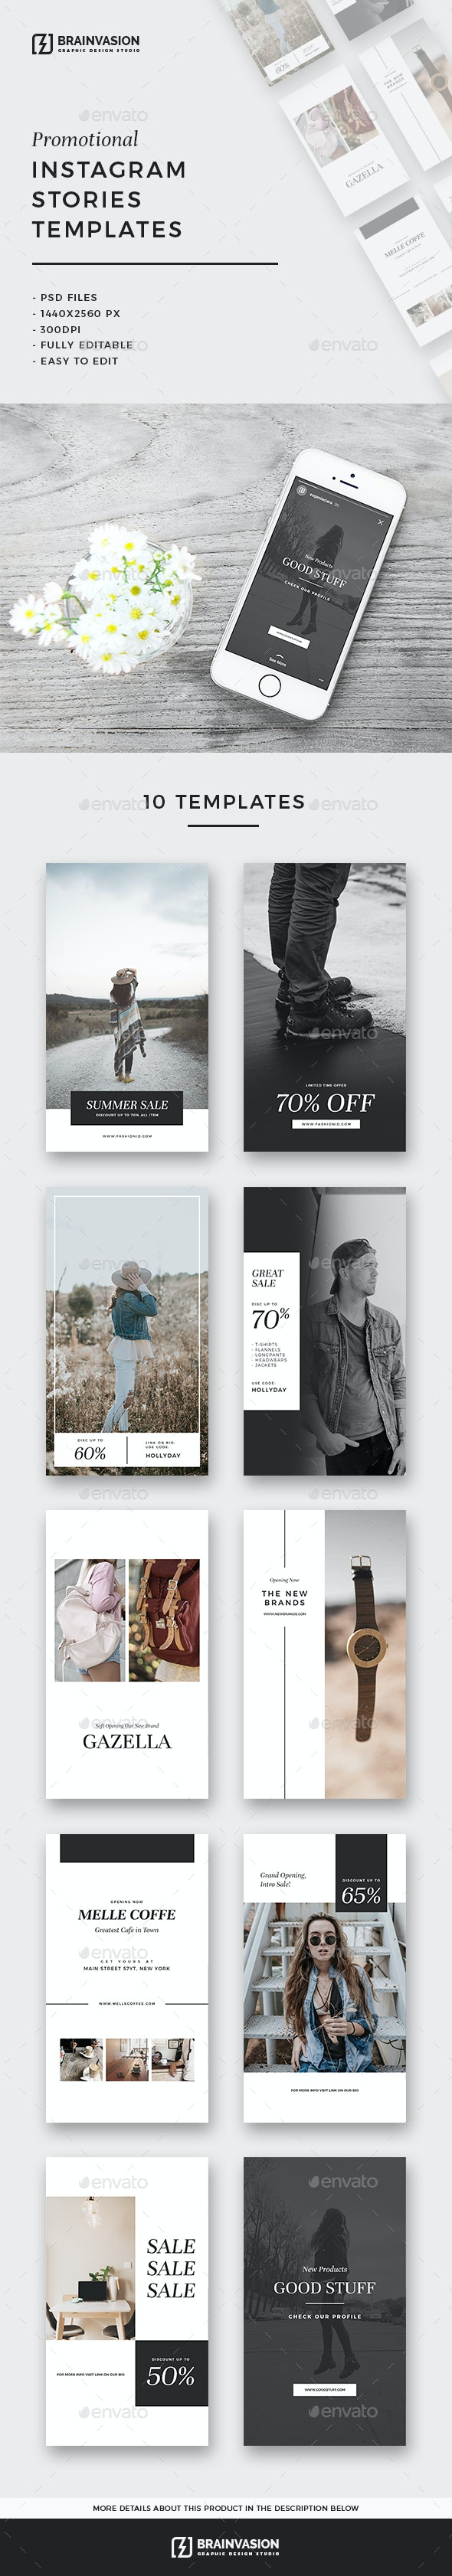 Promotional Instagram Stories Templates - Social Media Web Elements